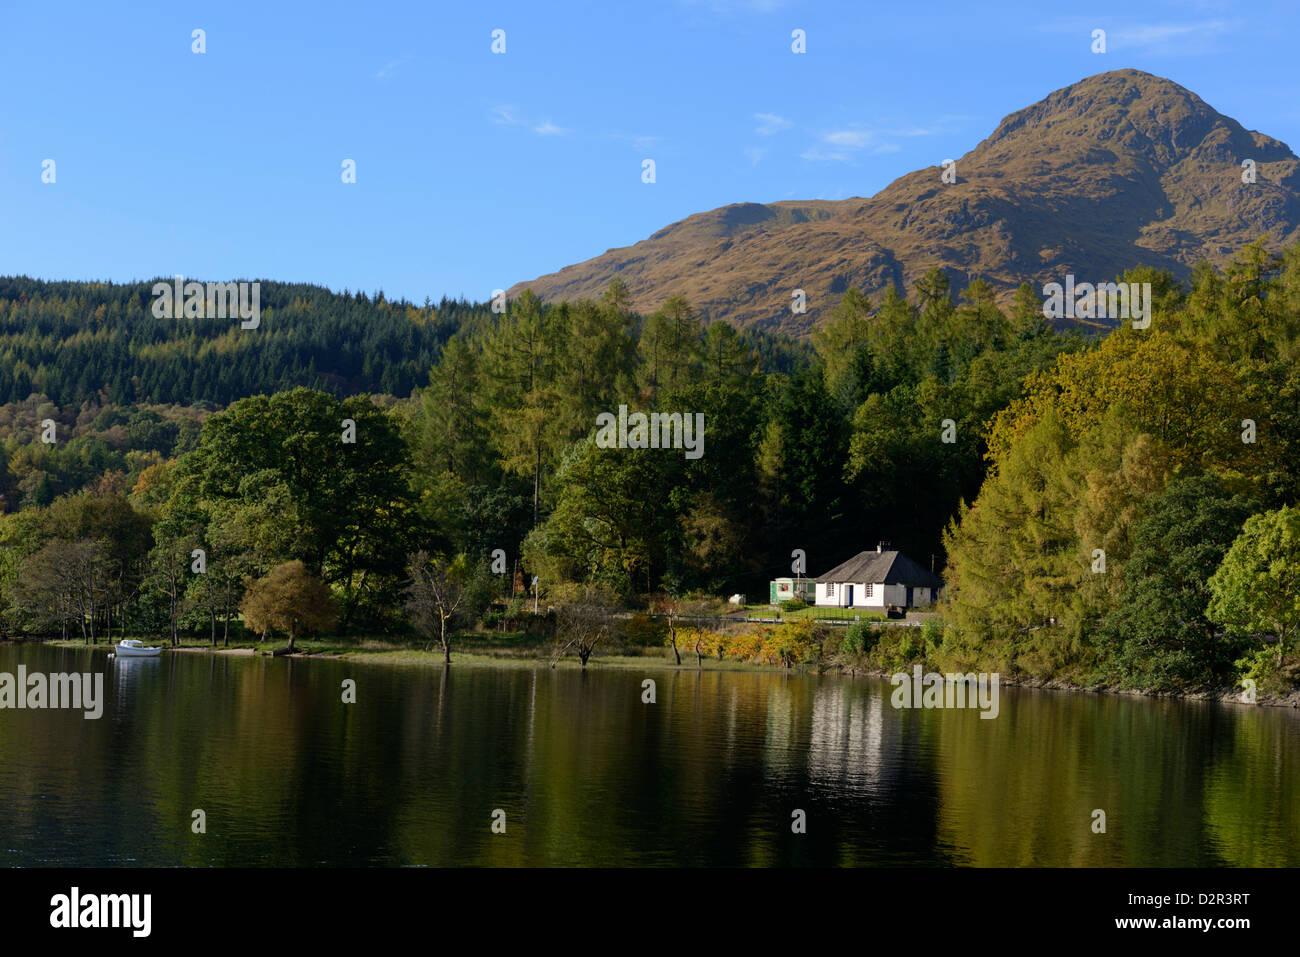 Waterside cottage, Inveruglas, Loch Lomond, Stirling, Scotland, United Kingdom, Europe - Stock Image